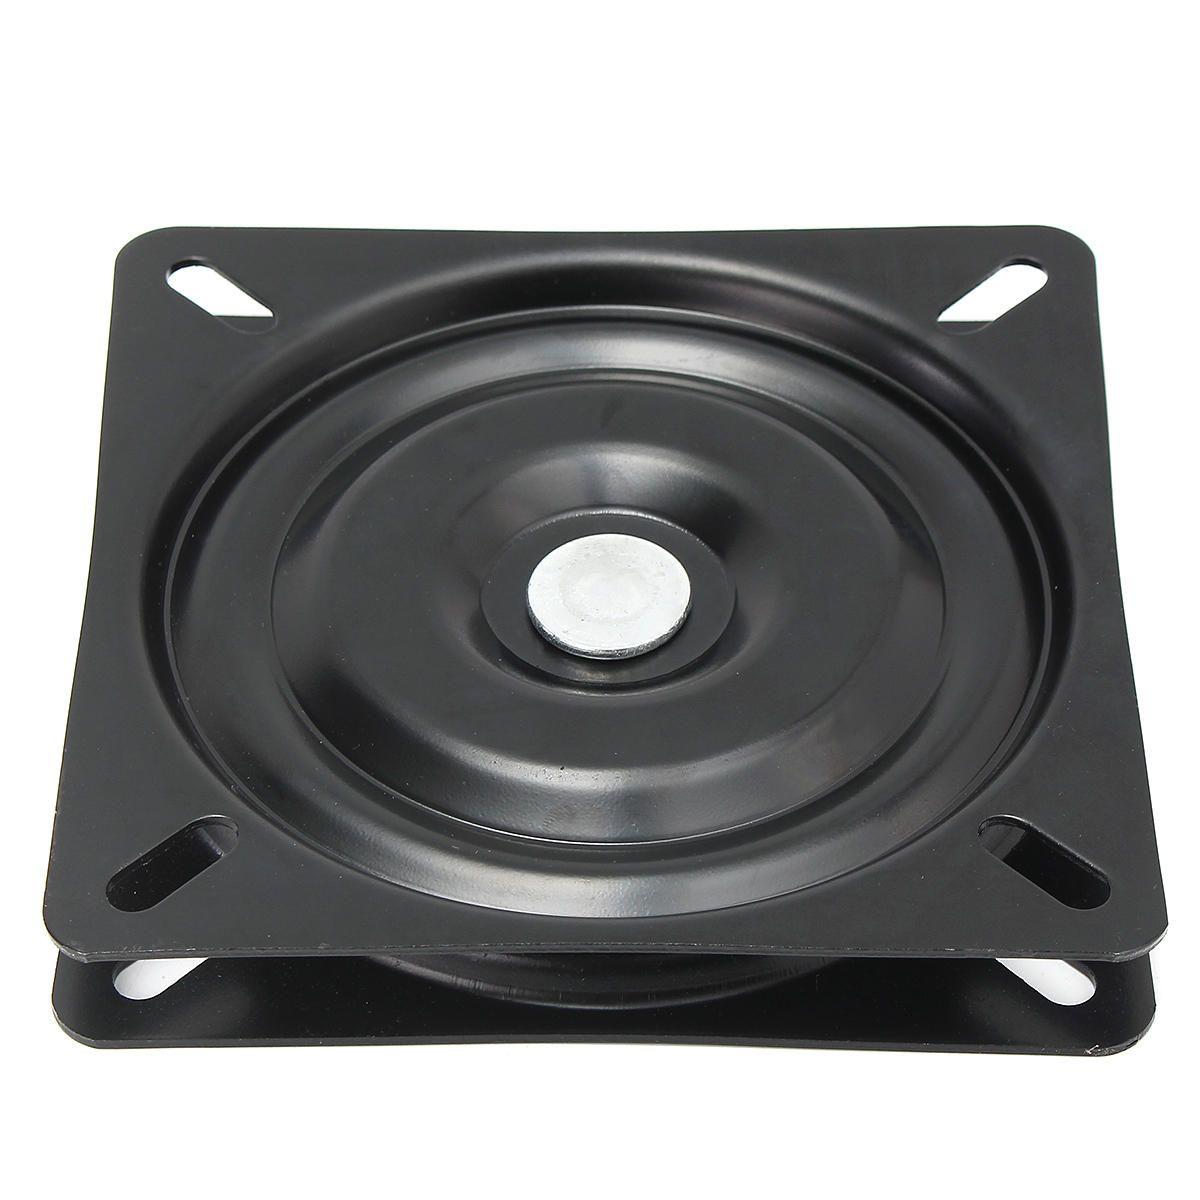 6 inch 360 degree swivel seat mount base black coated